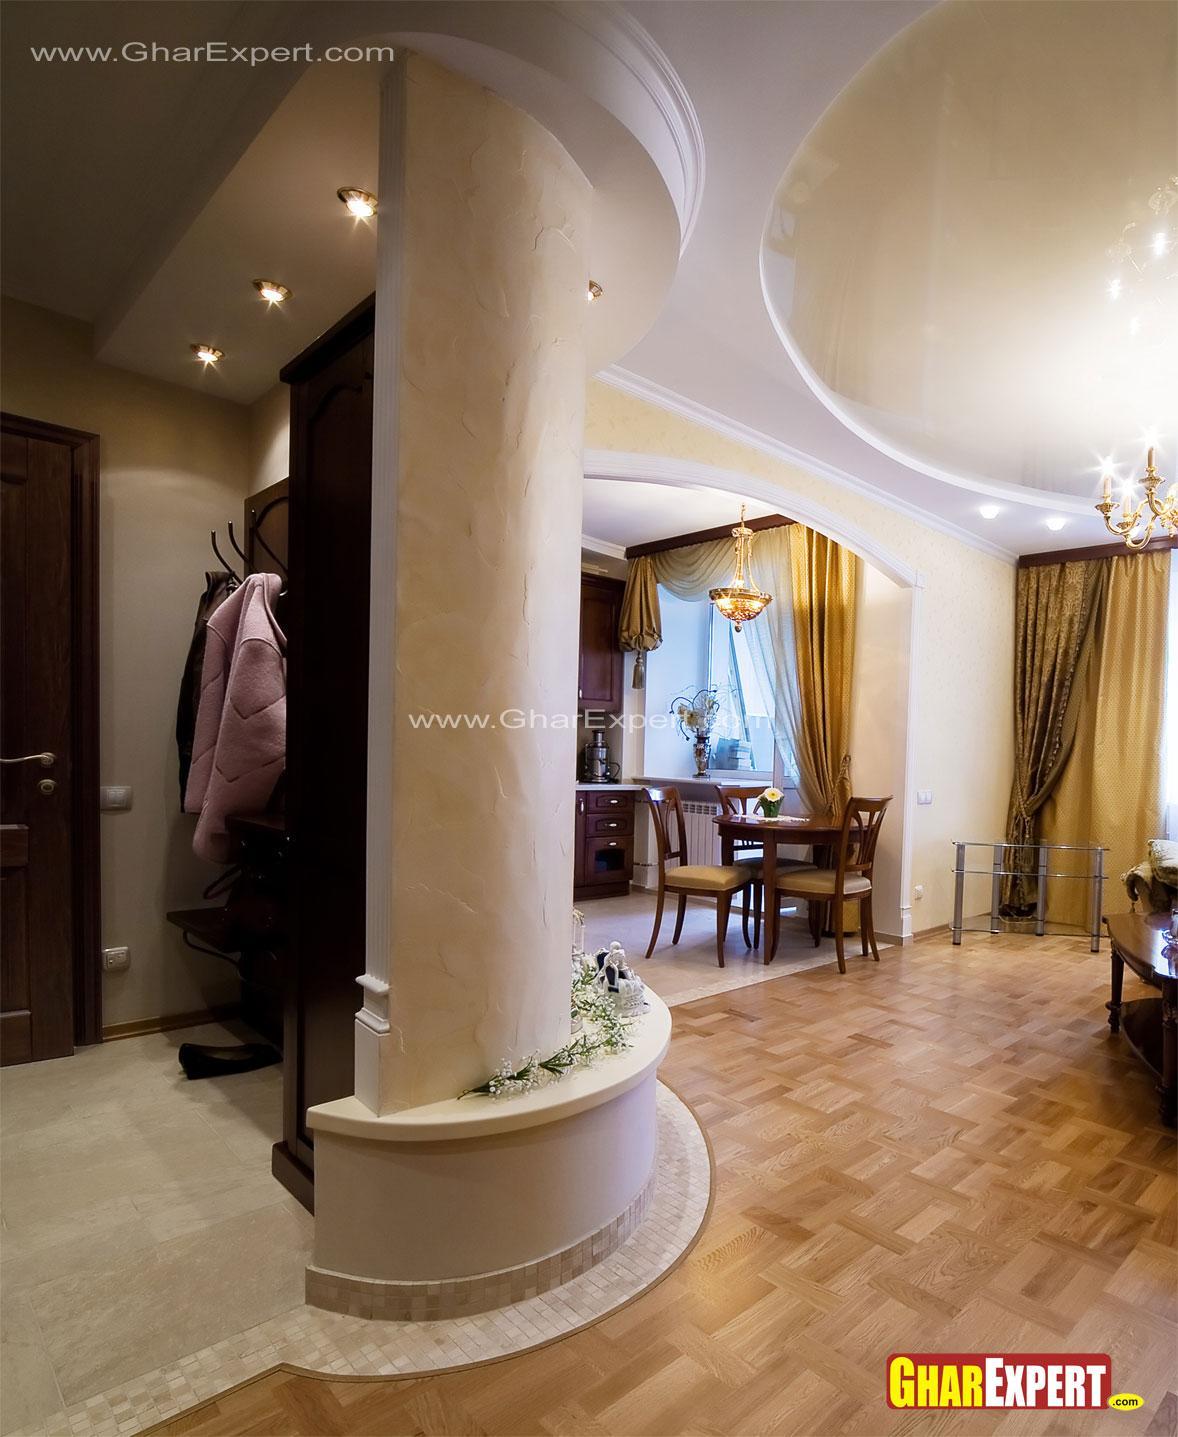 Pillar Decoration In Living Room How To Hide Types Of: Decorative Pillar Design